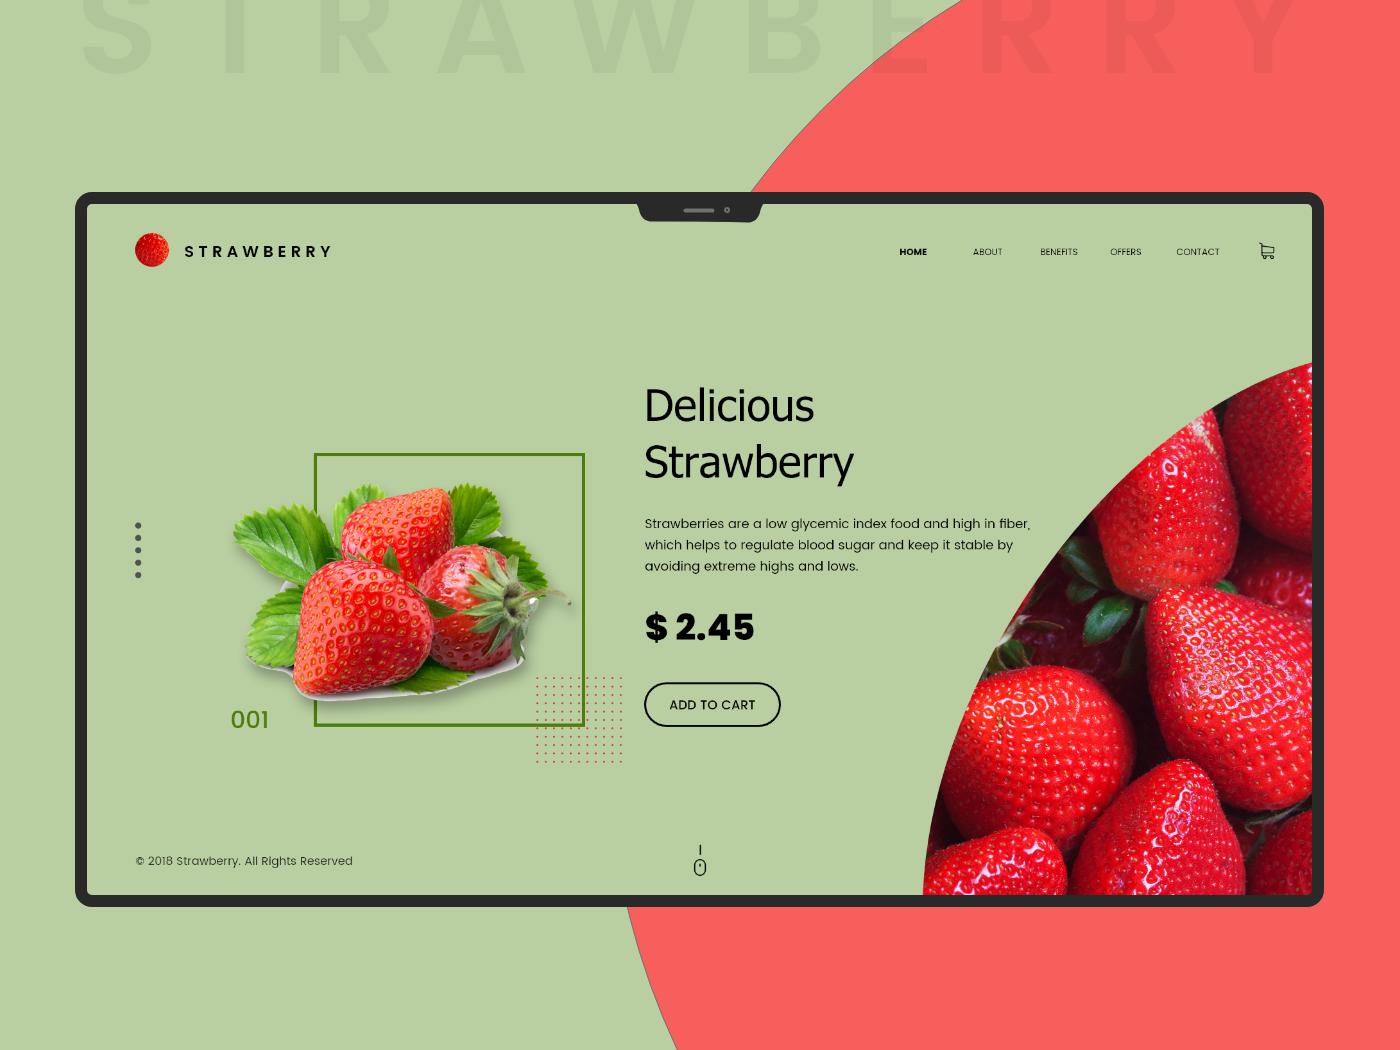 Strawberry Conceptual Design free xd psd freebie xd fresh pink red fruits fruit illustration drinks food web ui design design awesome website design website latest strawberries strawberry fruit